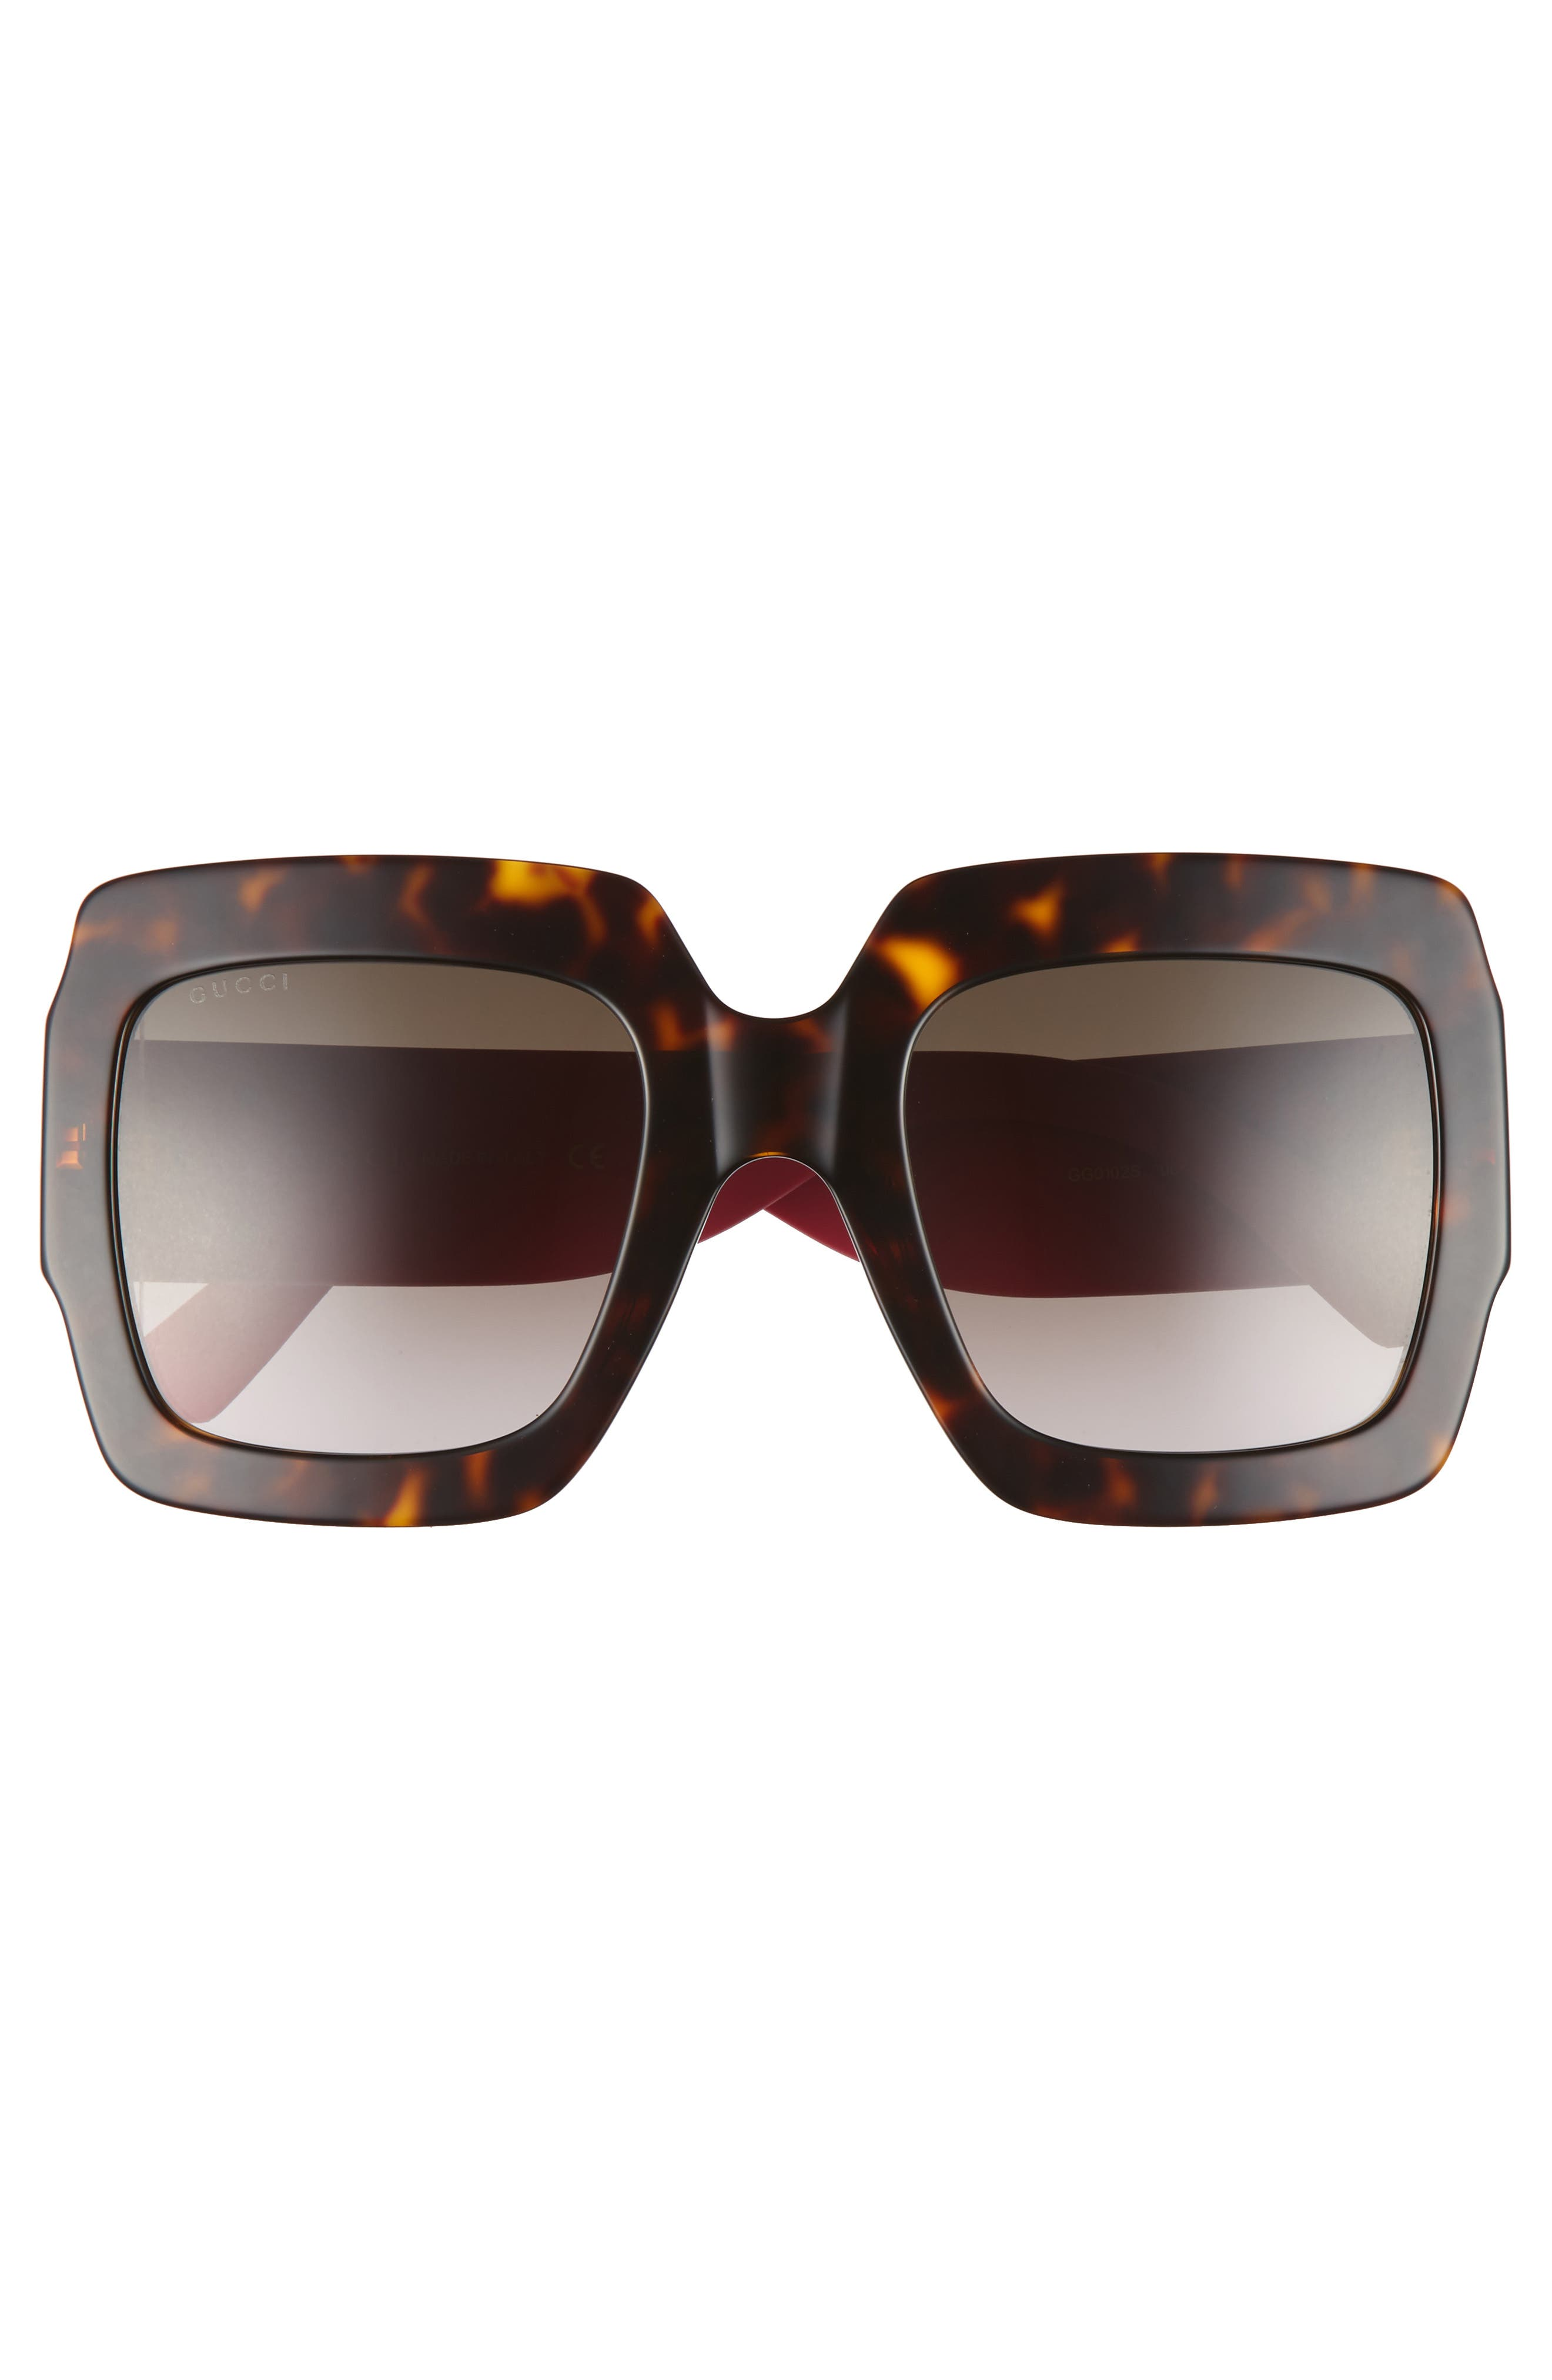 54mm Square Sunglasses,                             Alternate thumbnail 3, color,                             Havana/ Brown